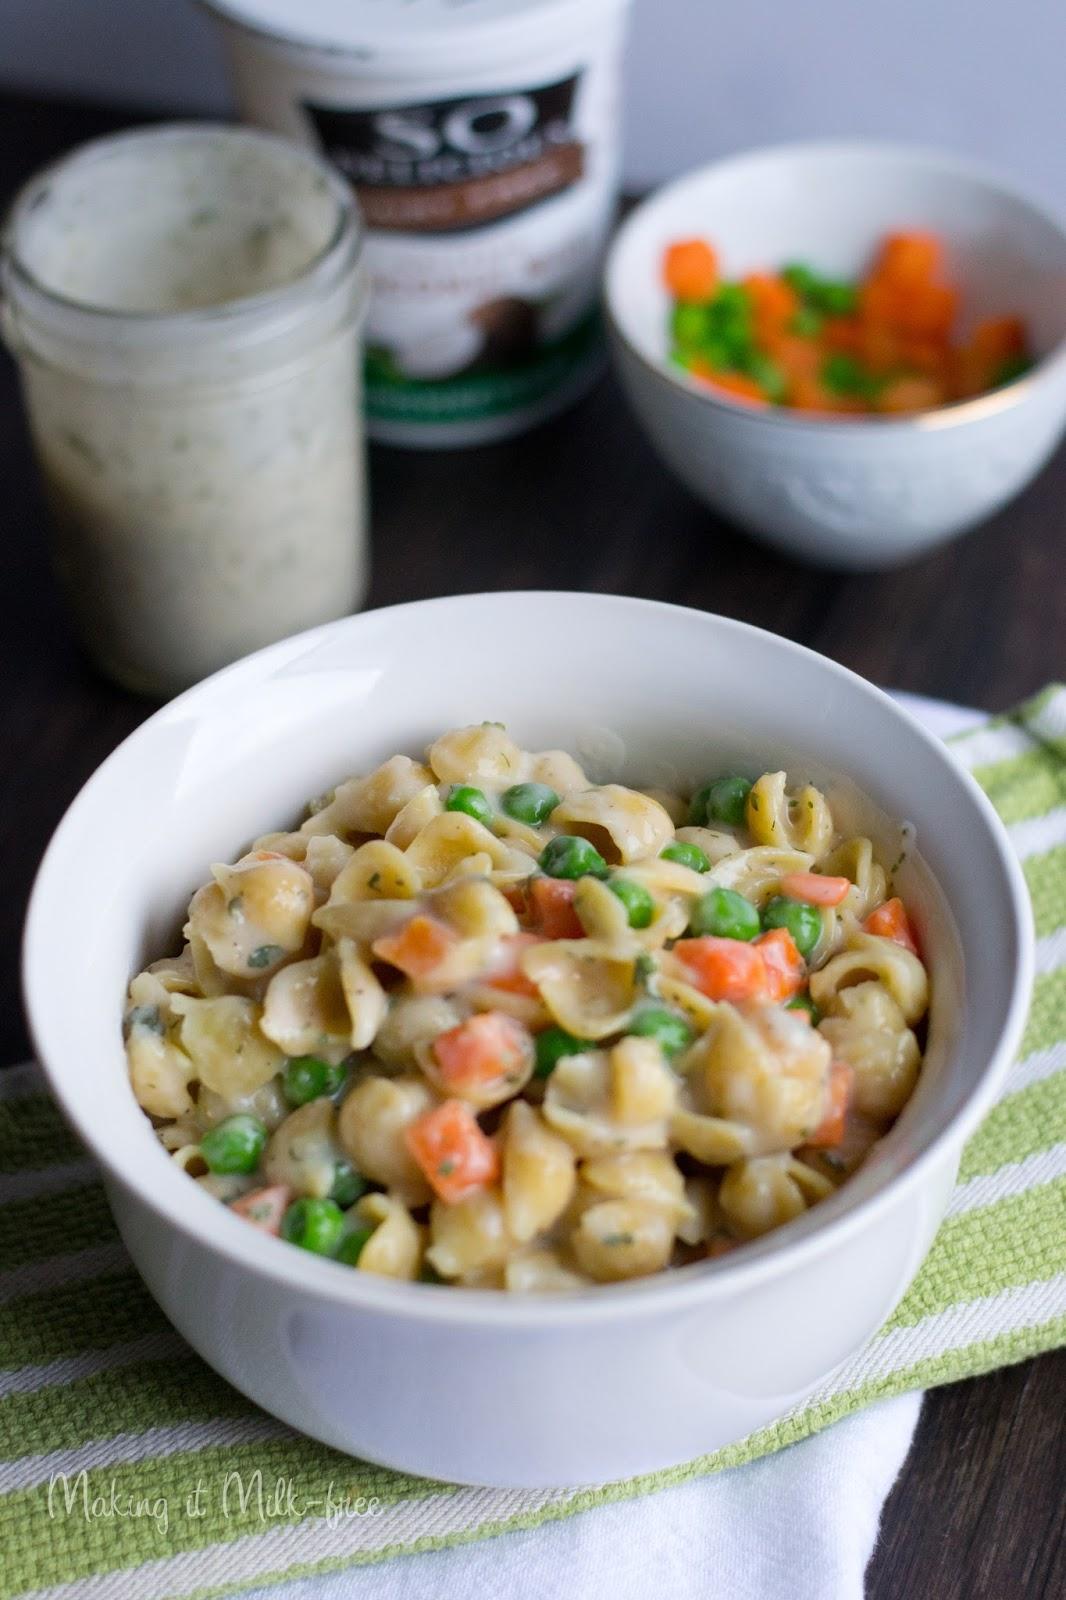 Creamy Ranch Pasta Salad {vegan + gluten free} from Making it Milk-free